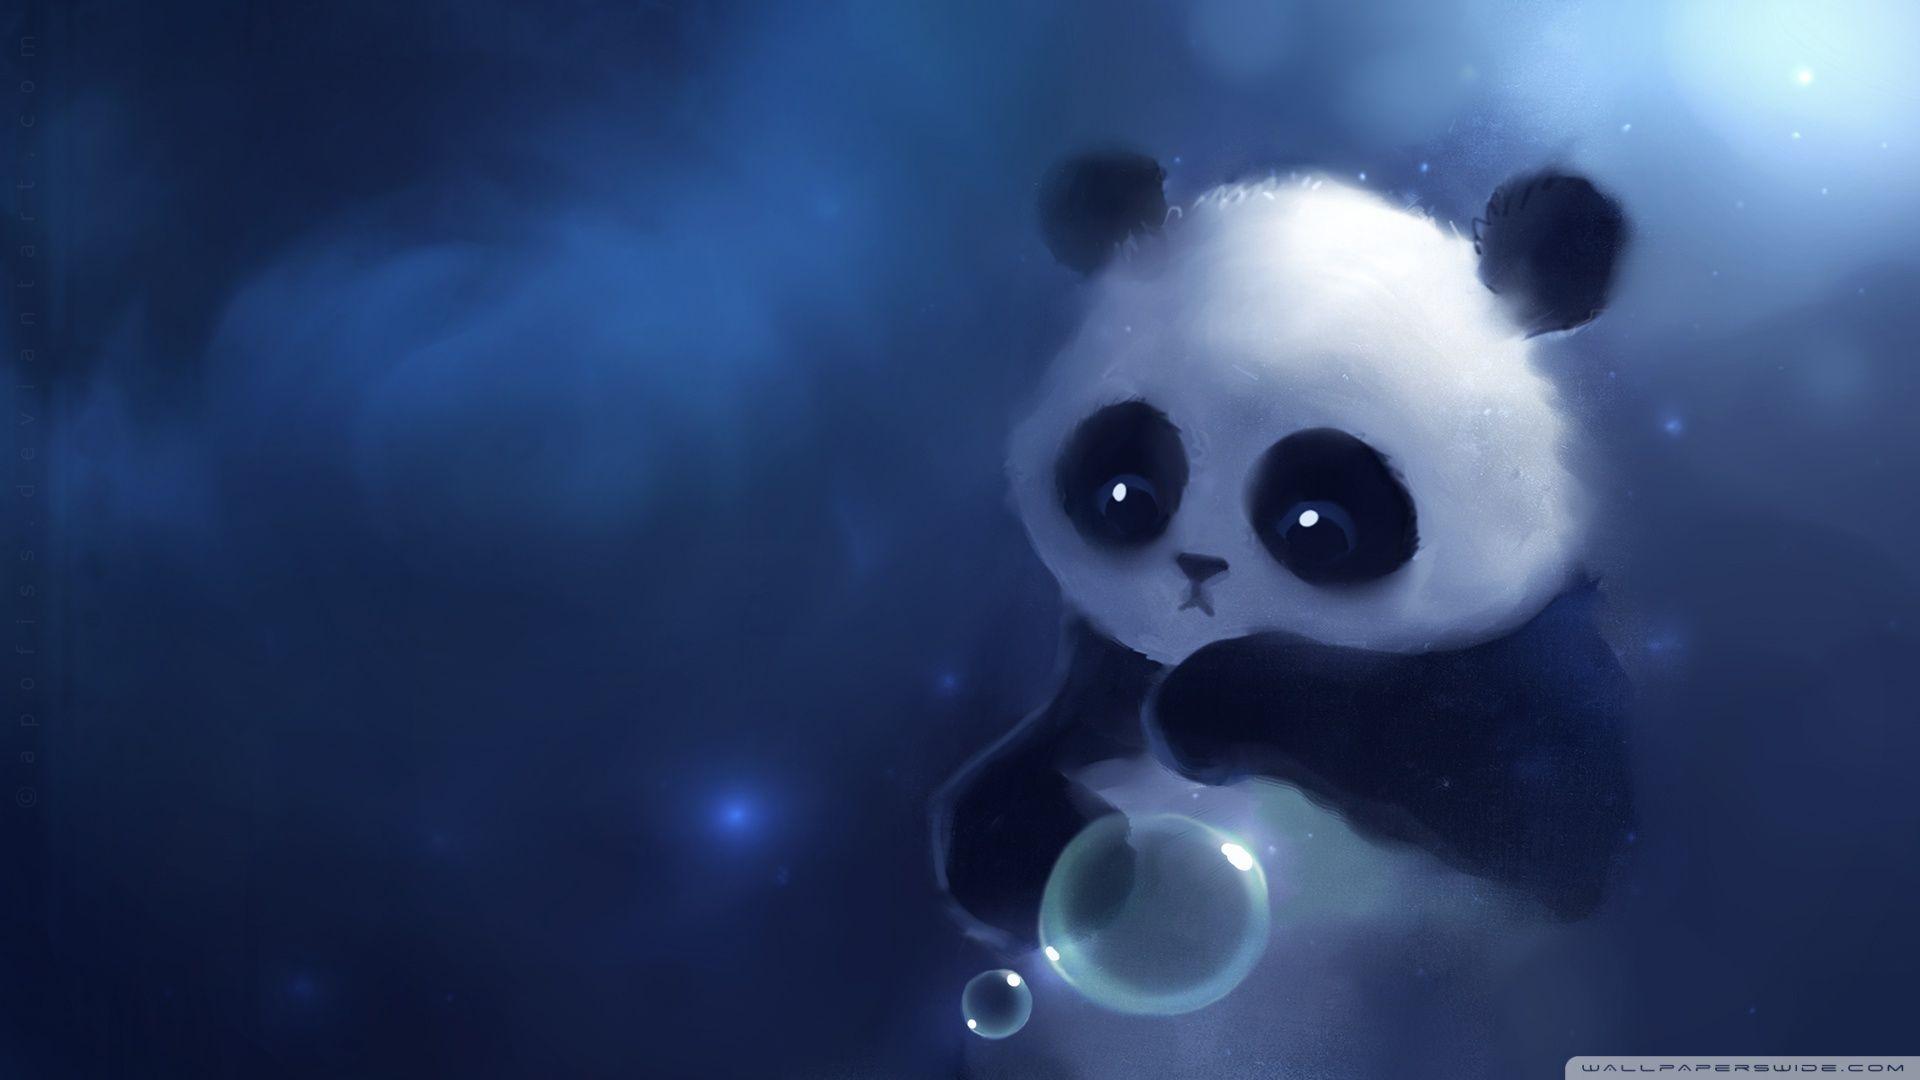 Awesome Free Red Panda Hd Wallpaper Free Download Panda Art Cute Panda Cartoon Cute Panda Wallpaper